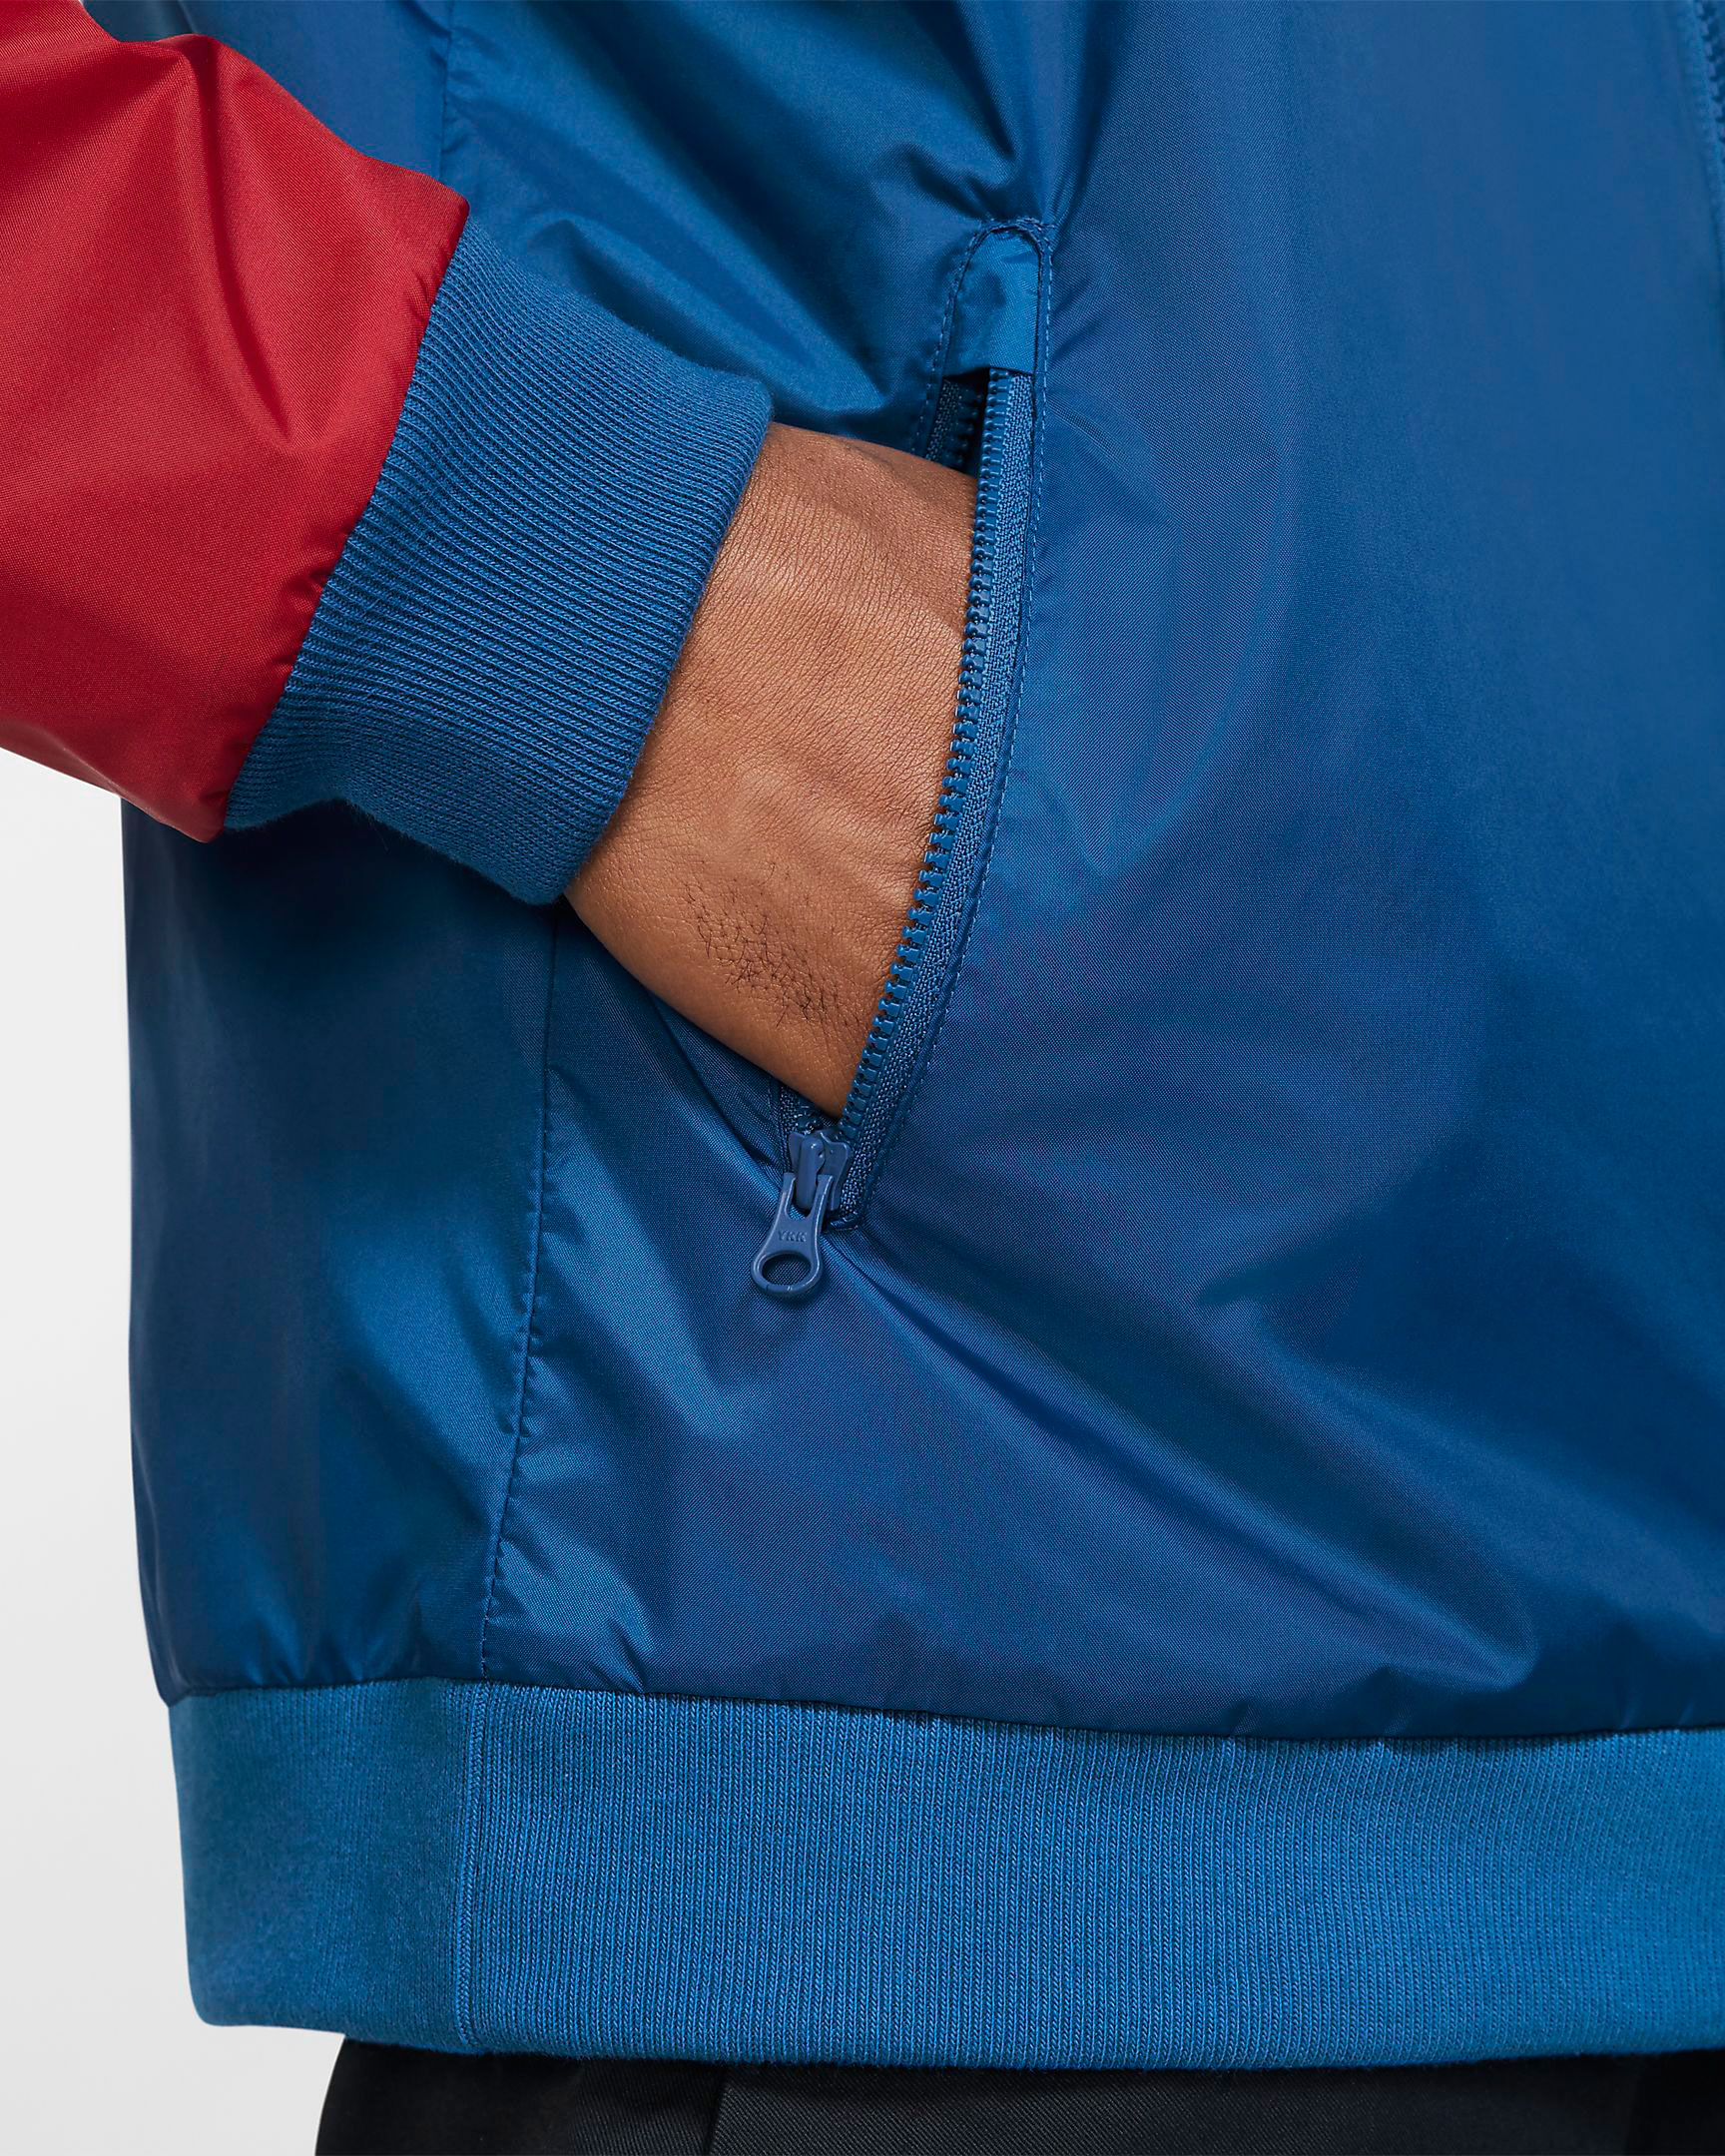 nike-americana-red-white-blue-windrunner-jacket-5